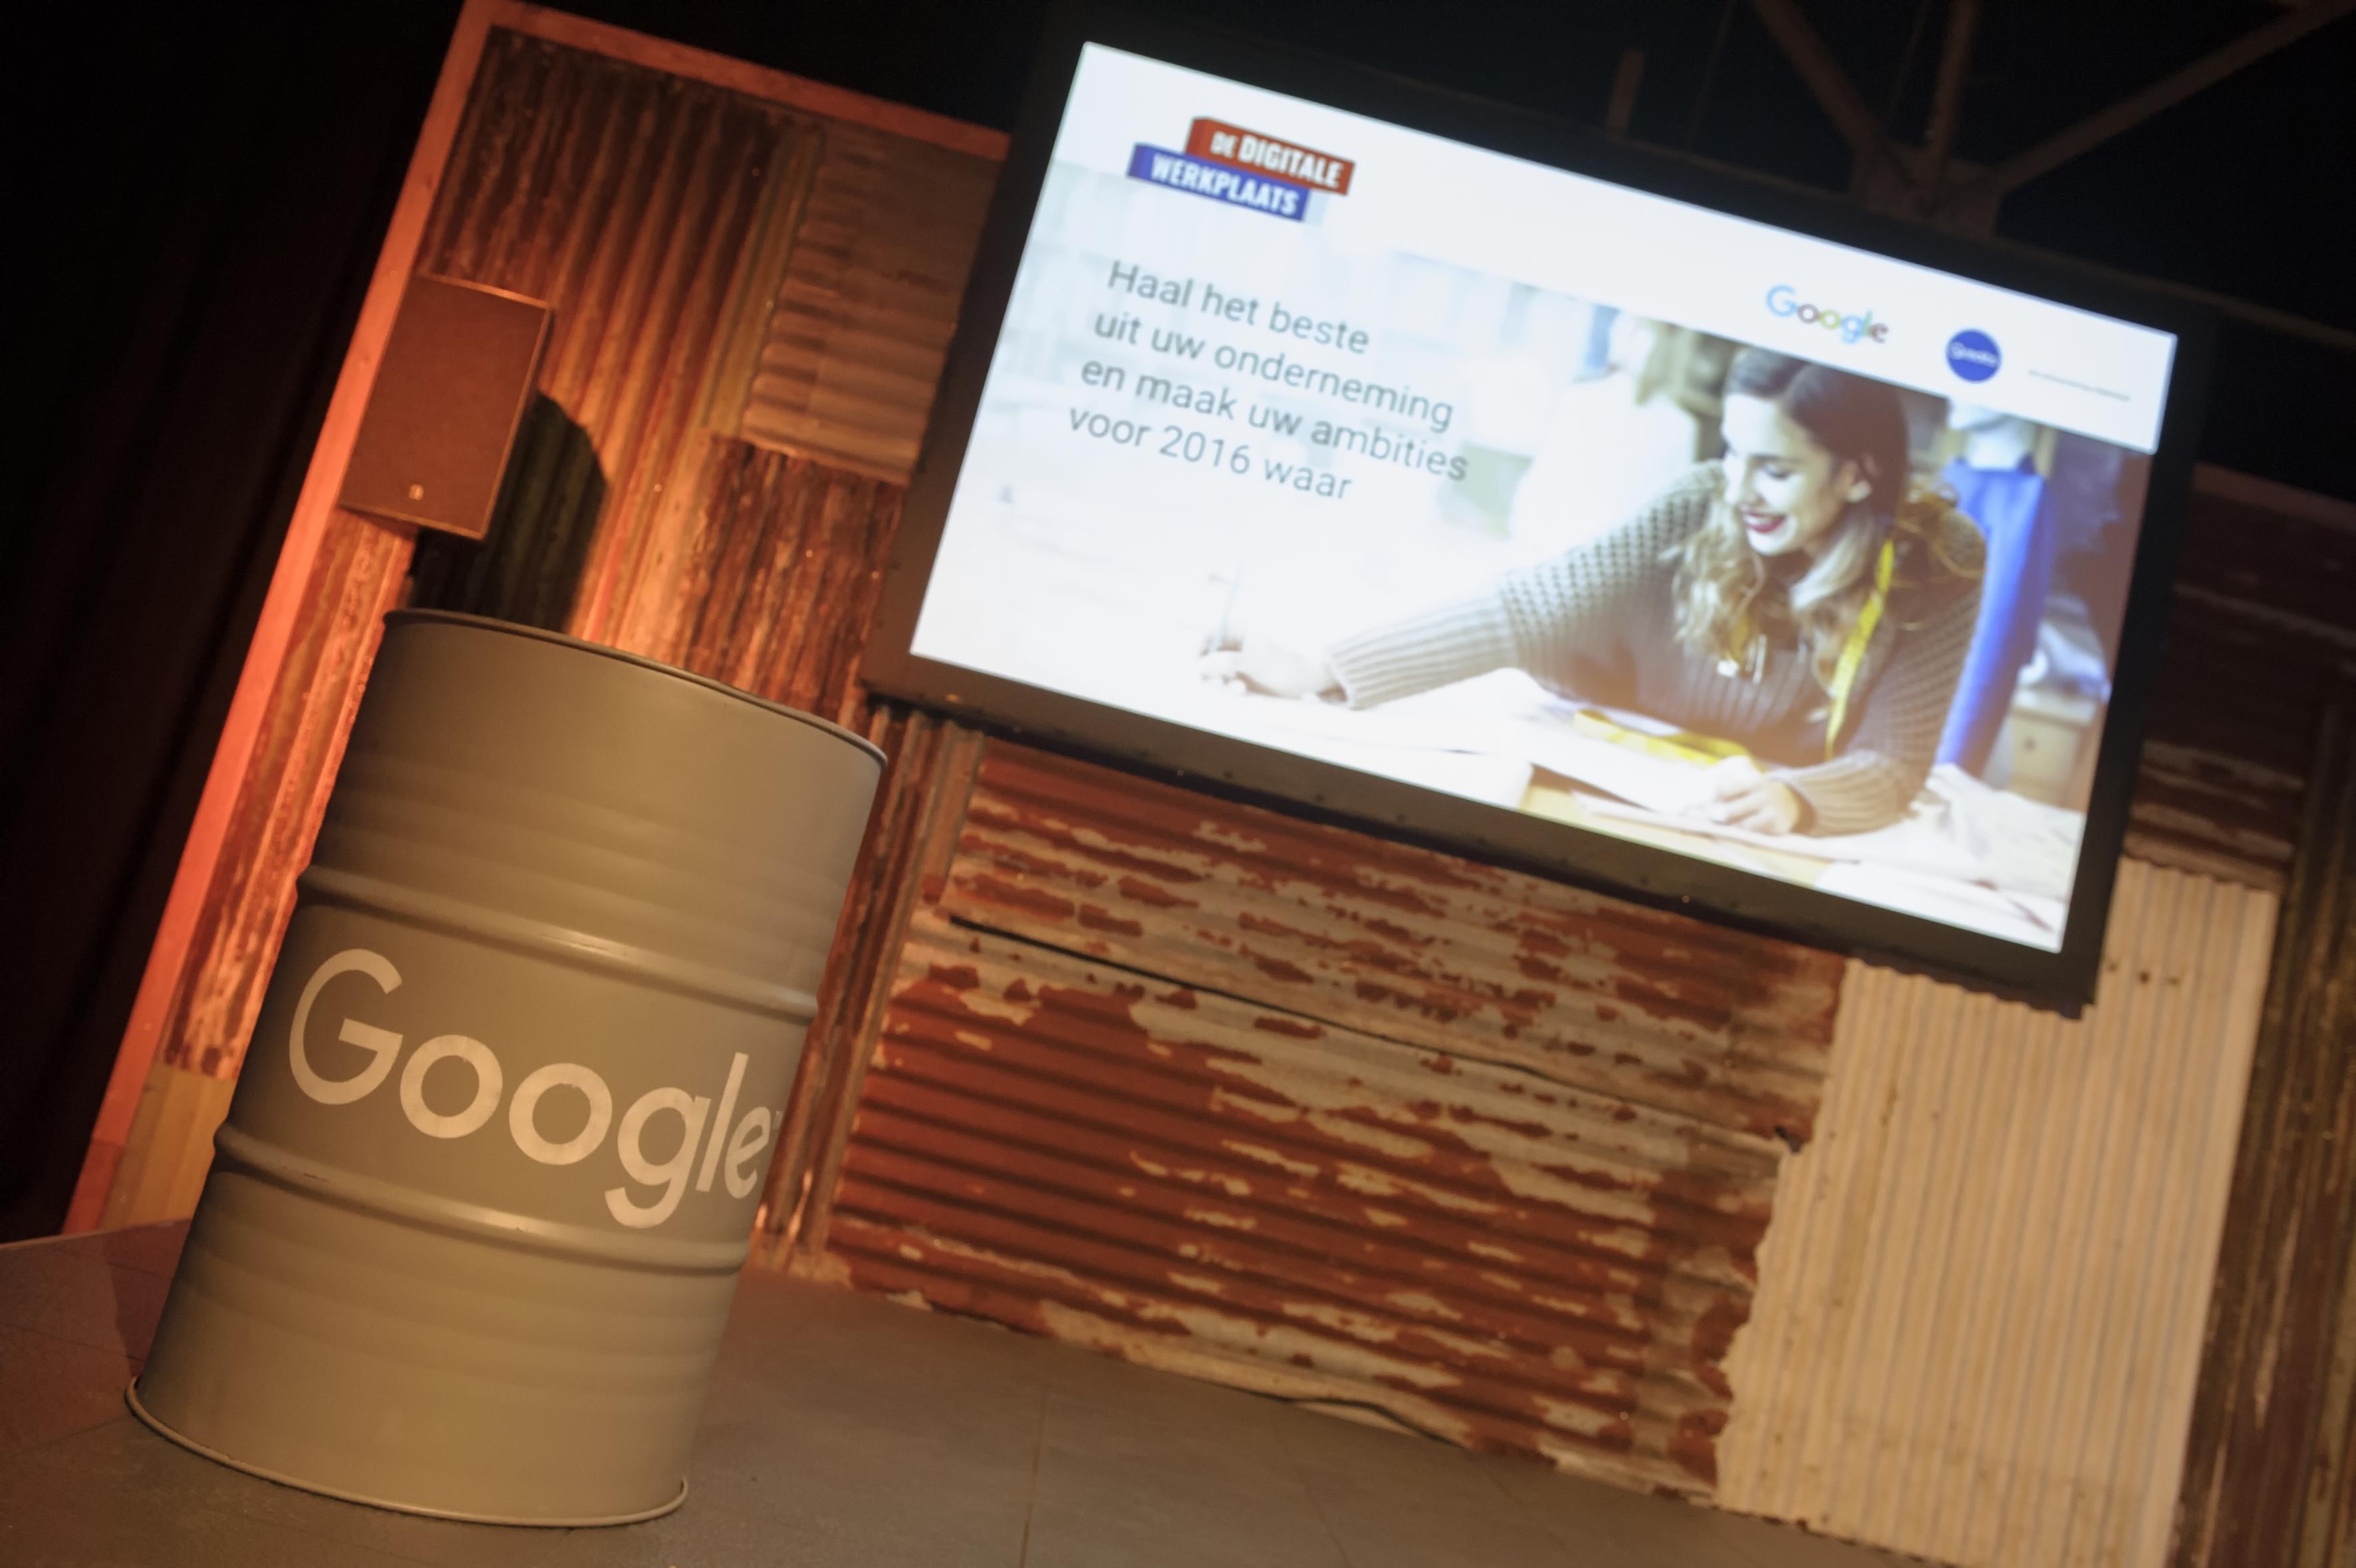 Gratis Google Workshops voor ondernemers